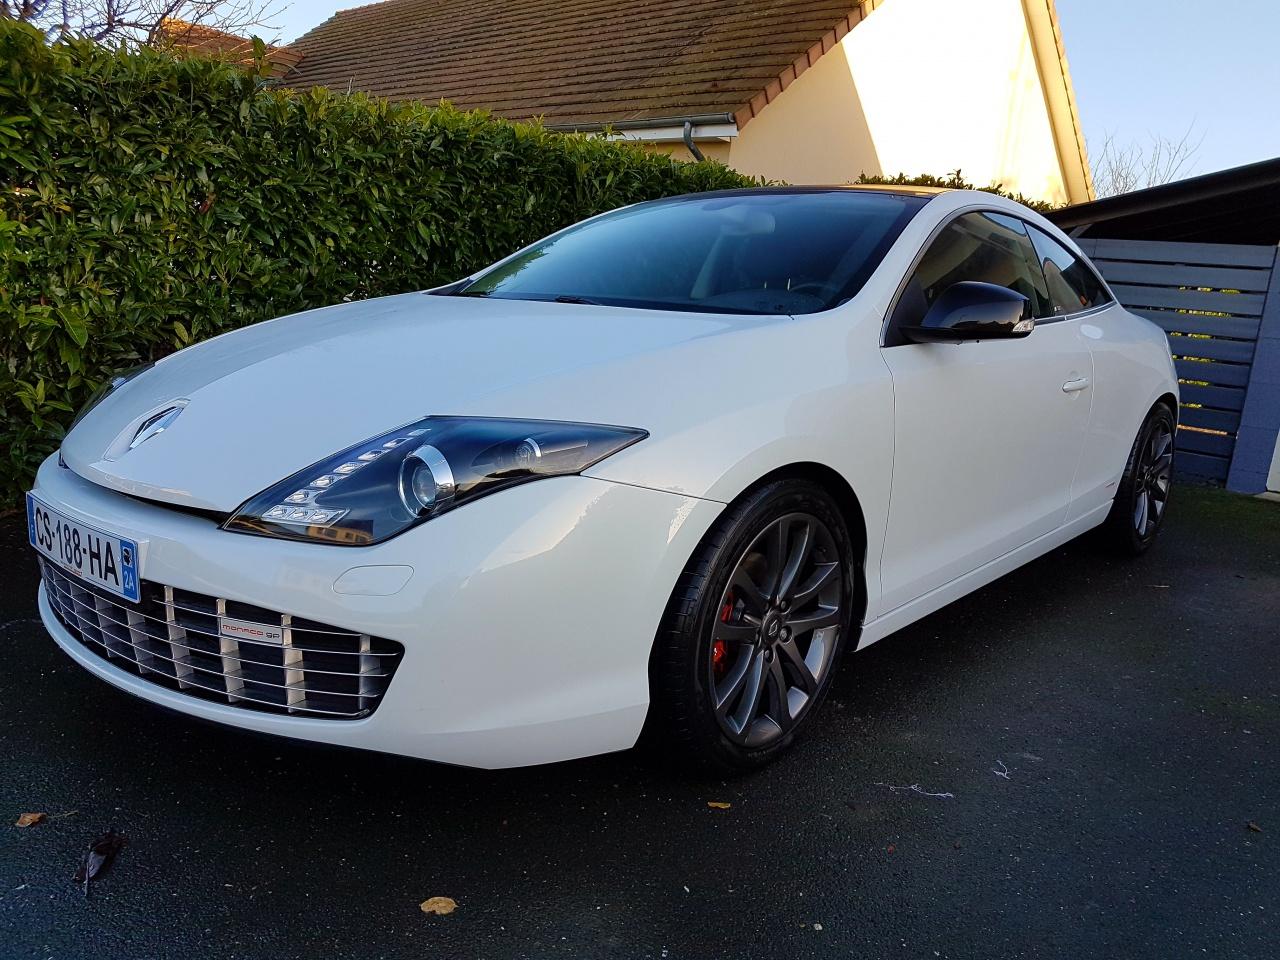 [f5sxd] Laguna III.2 Coupé 150cv Monaco Gp 53103420170102155236